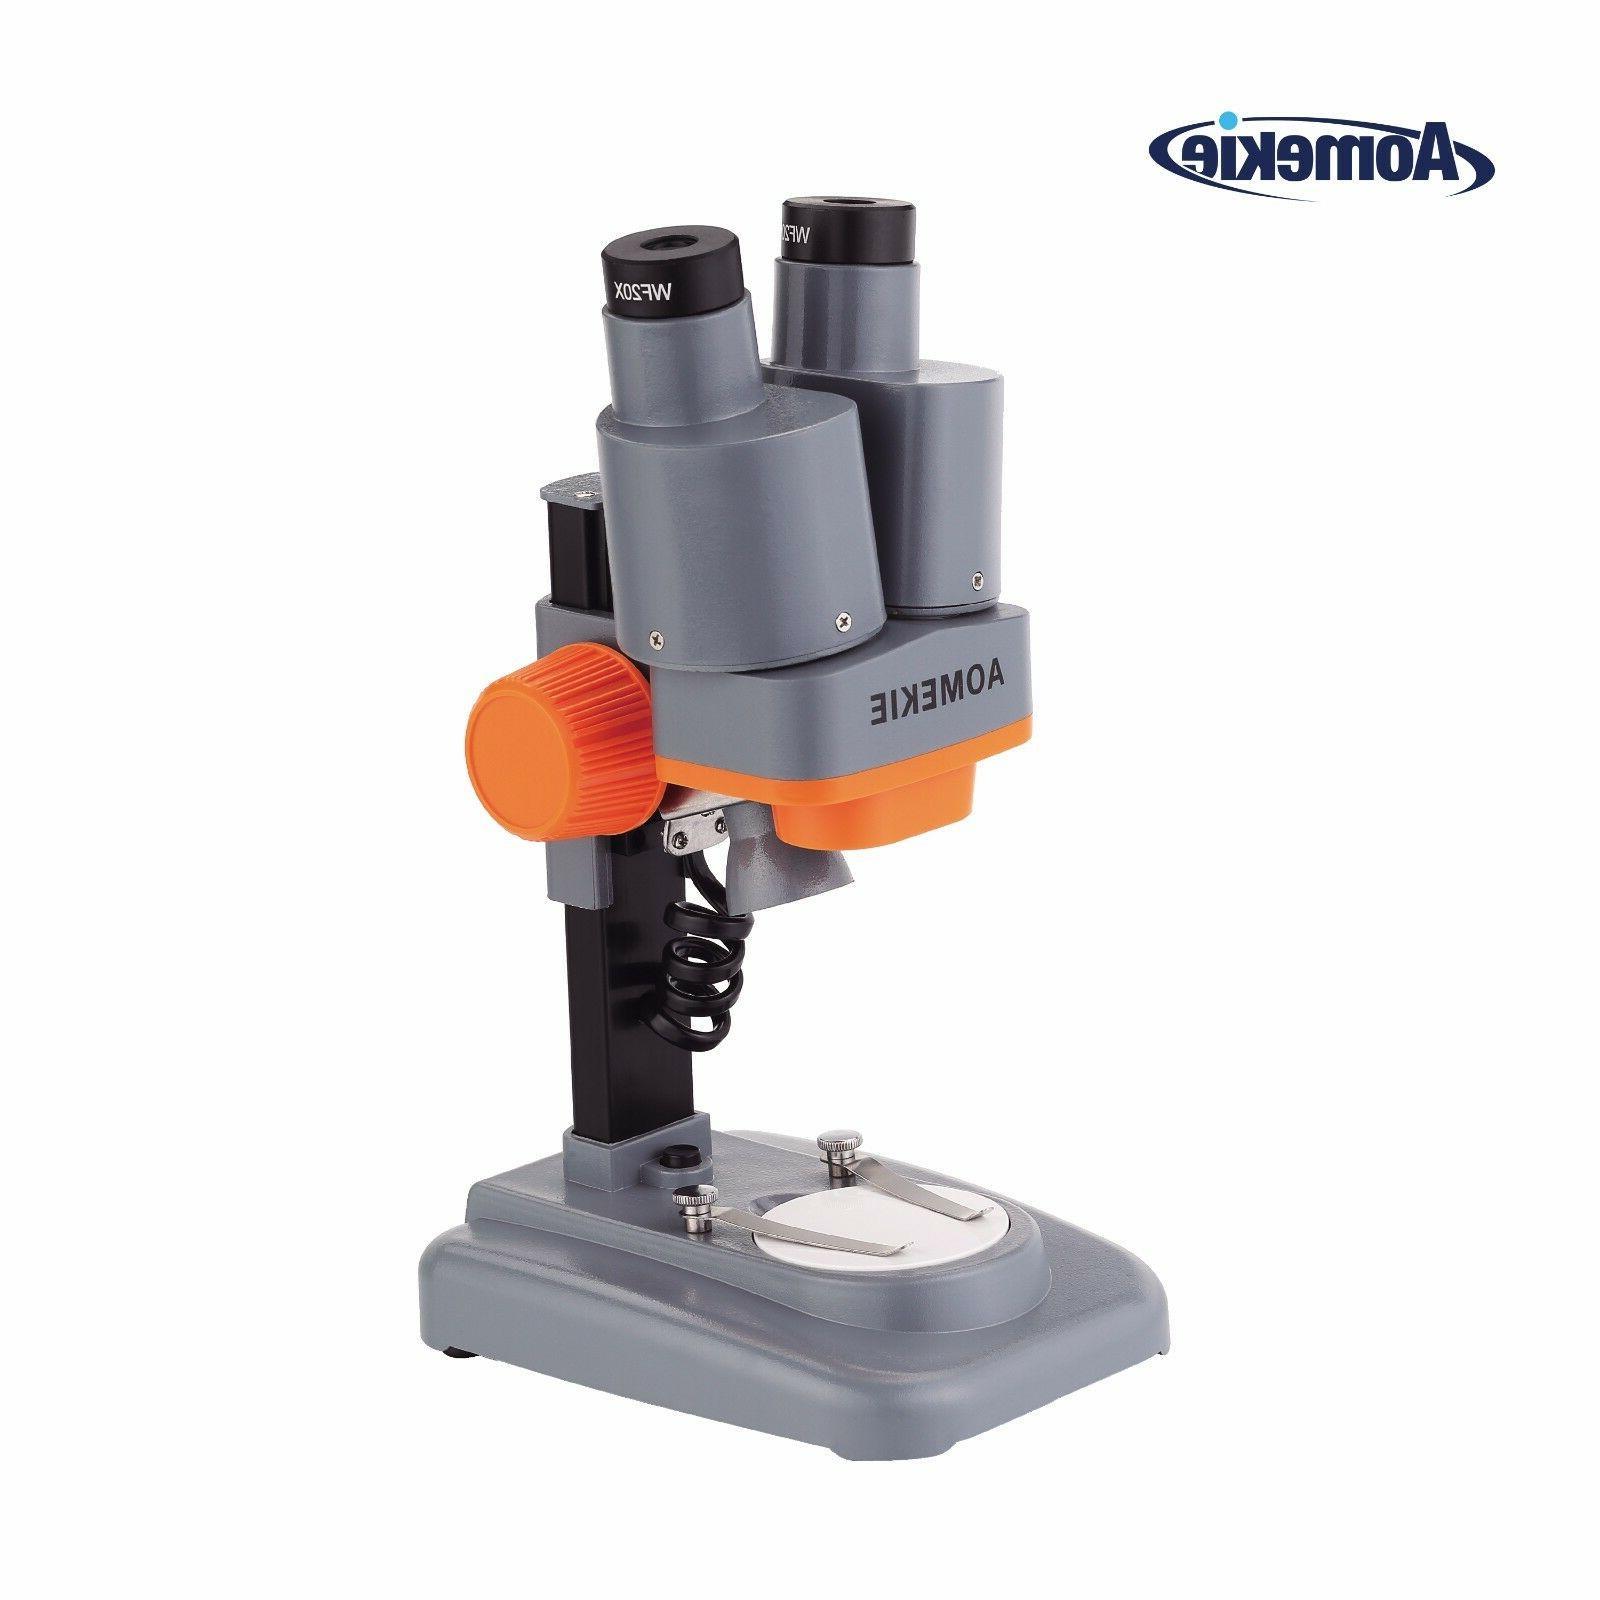 binocular 40x portable stereo microscope led